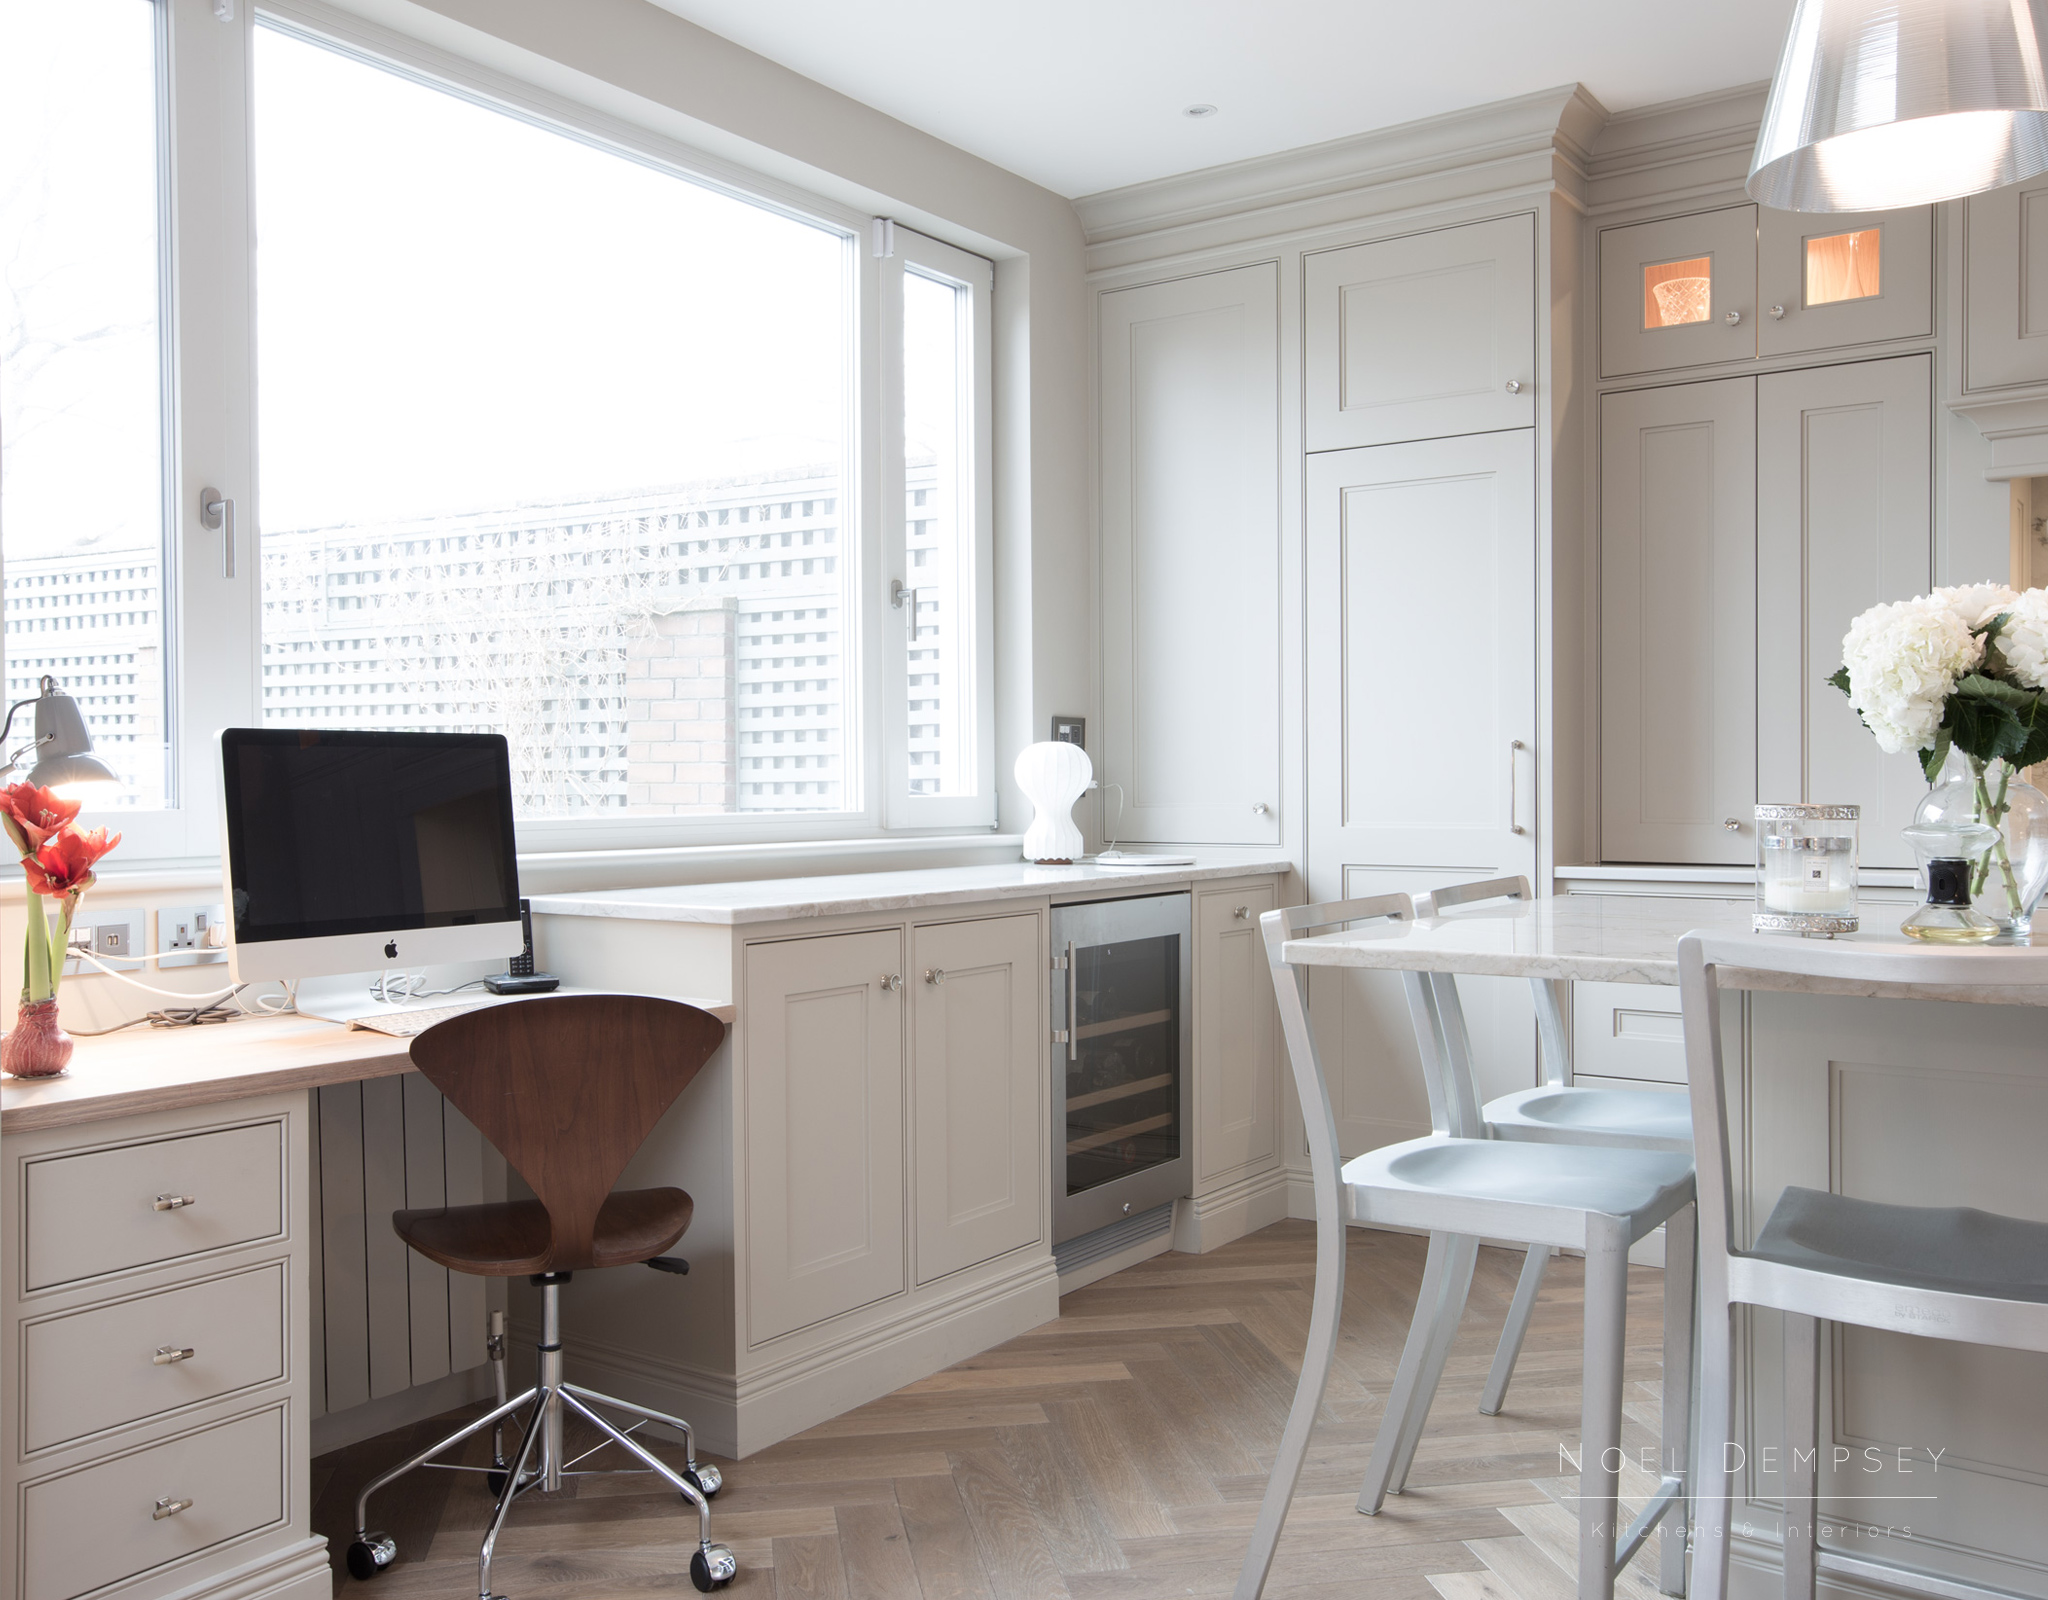 Dartry-Painted-Kitchens-3.jpg